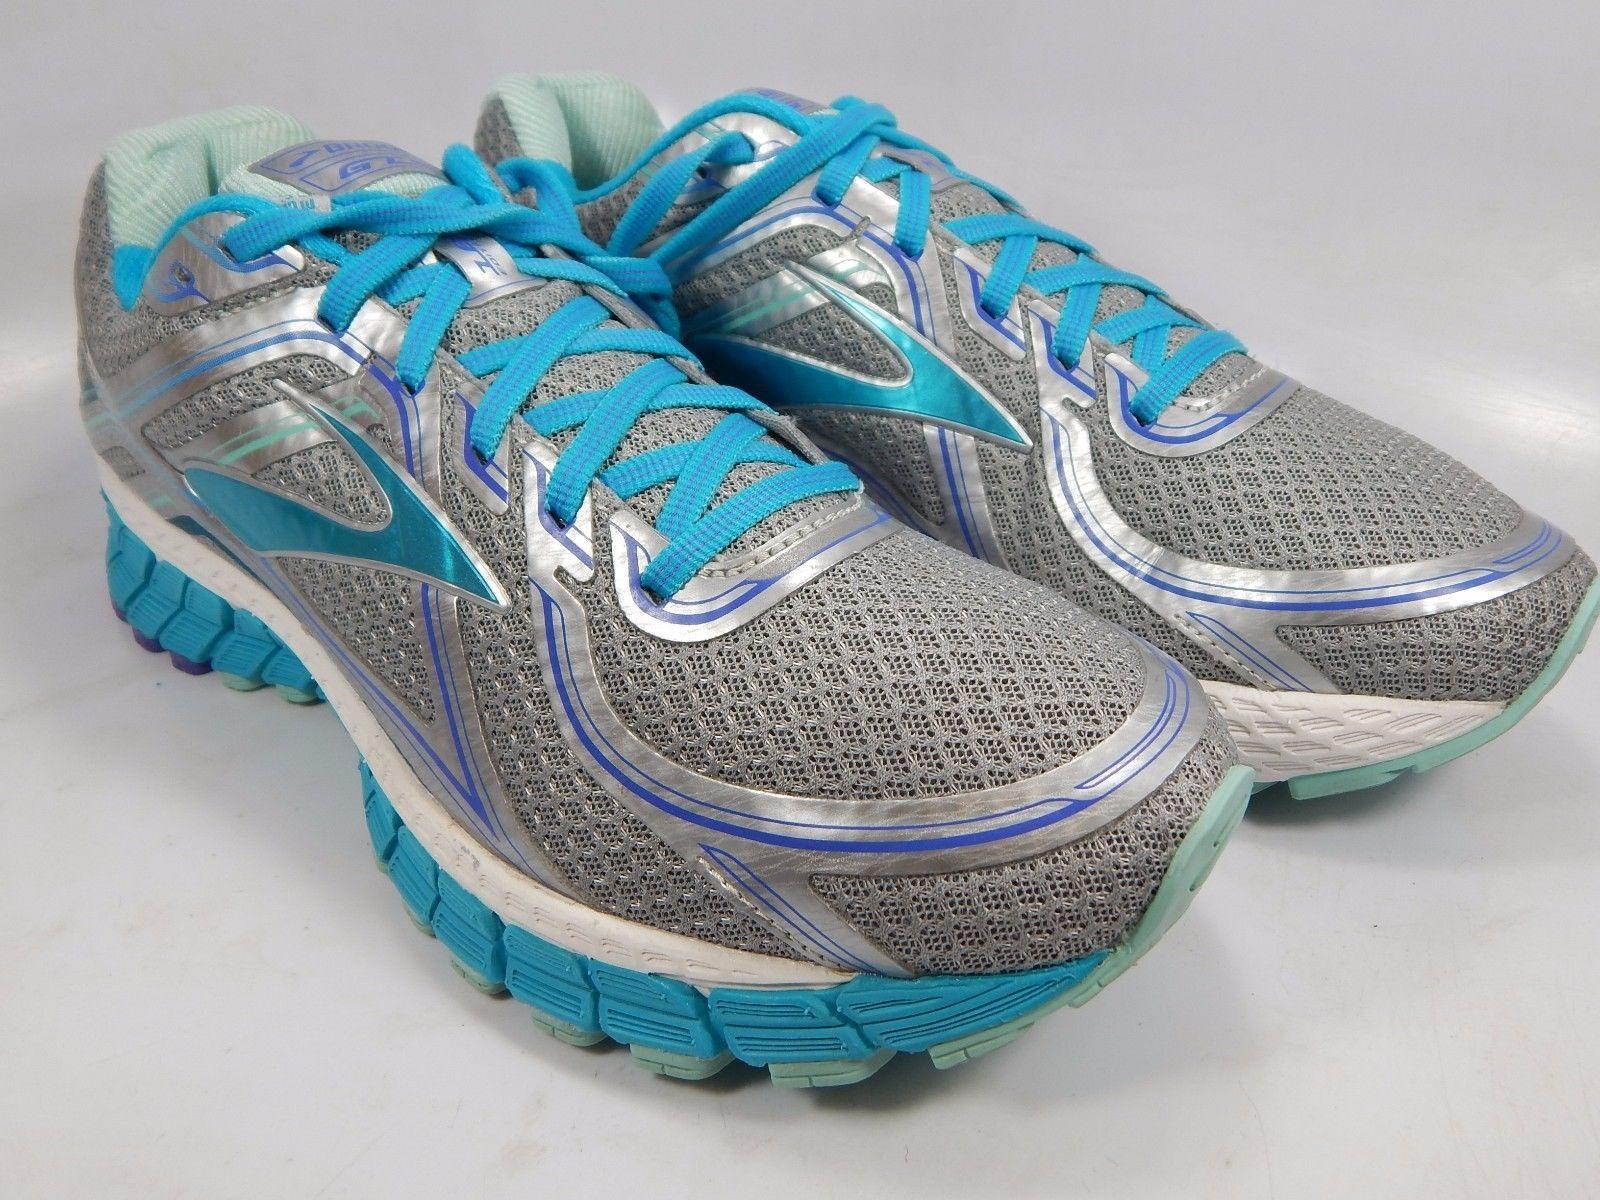 Brooks GTS 16 Women's Running Shoes Sz US 10.5 M (B) EU 42.5 Silver 1202031B170